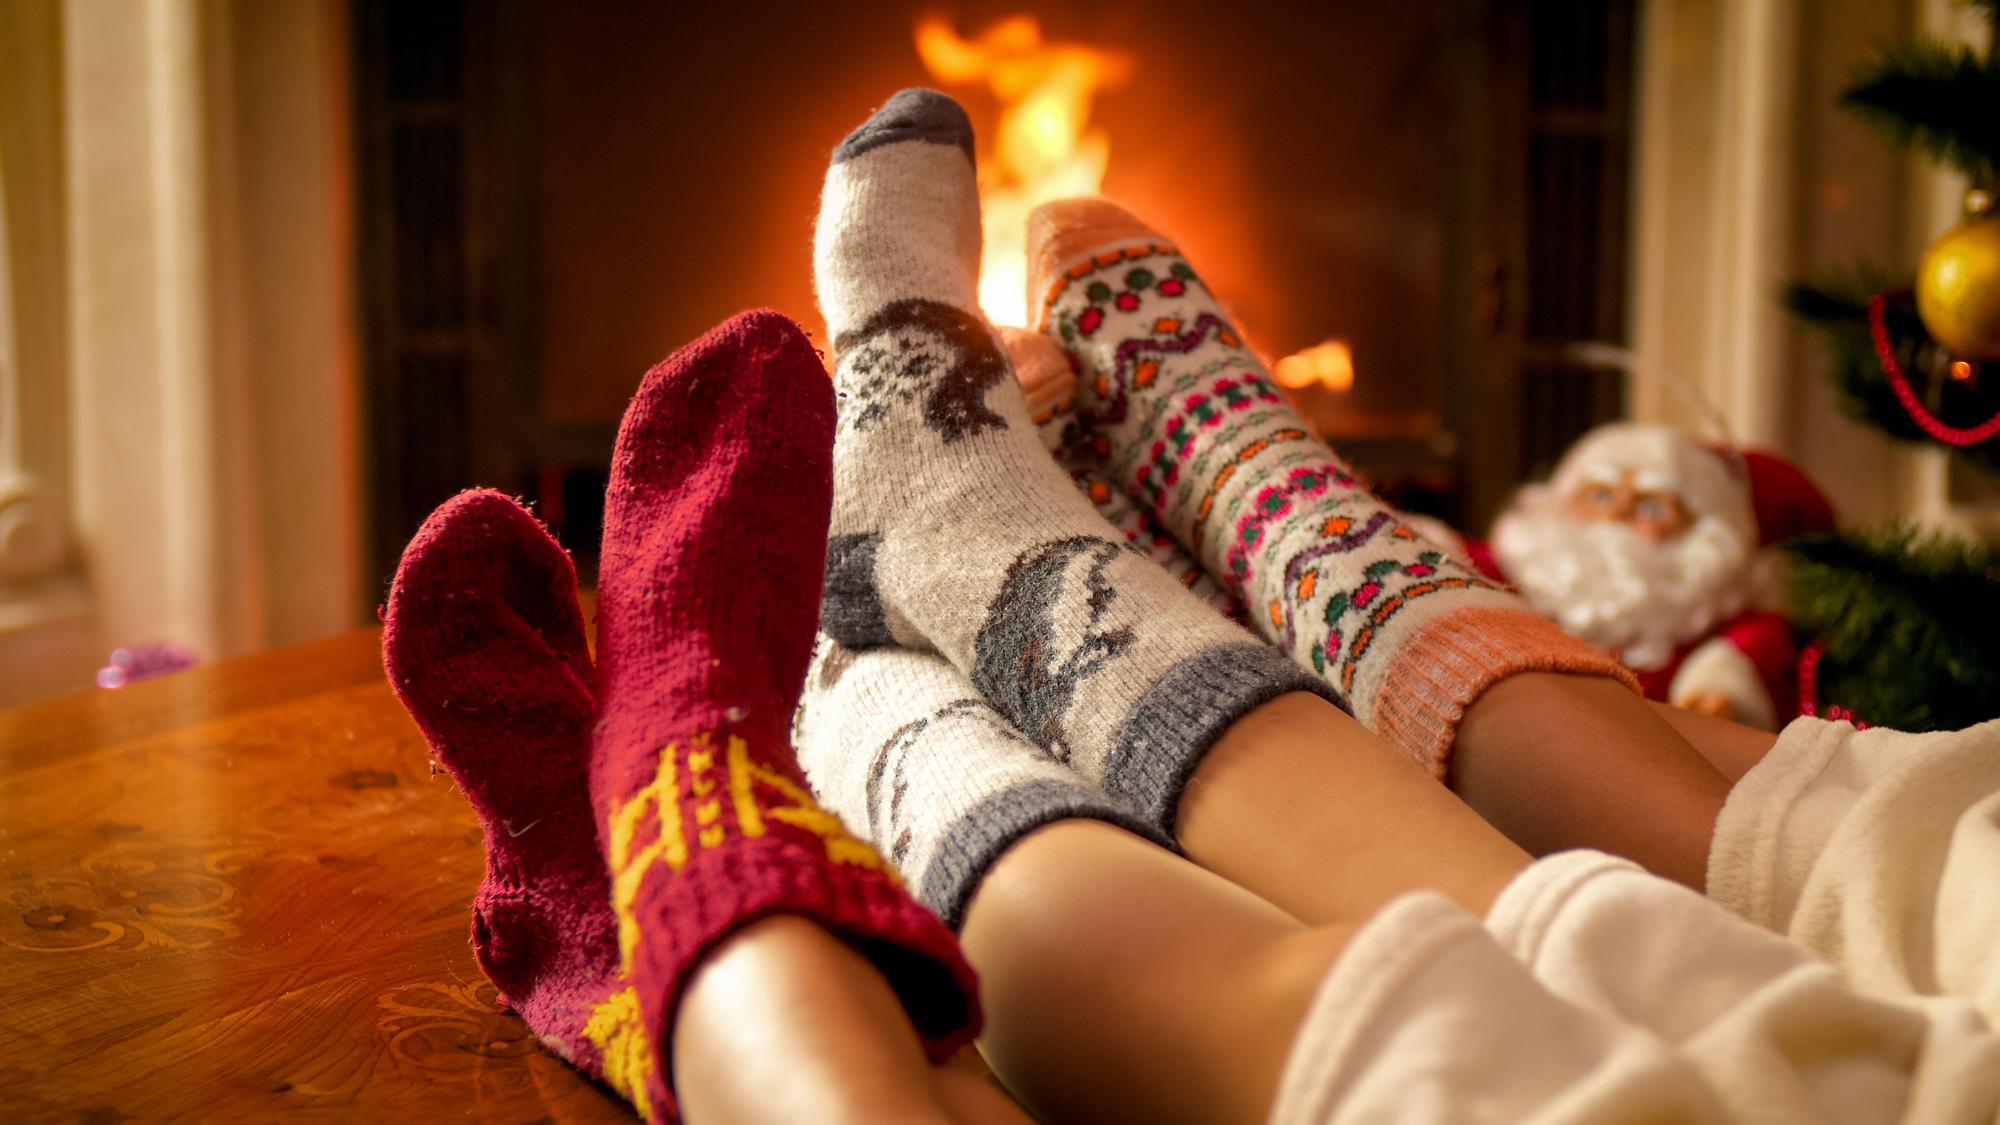 cosy winter nights